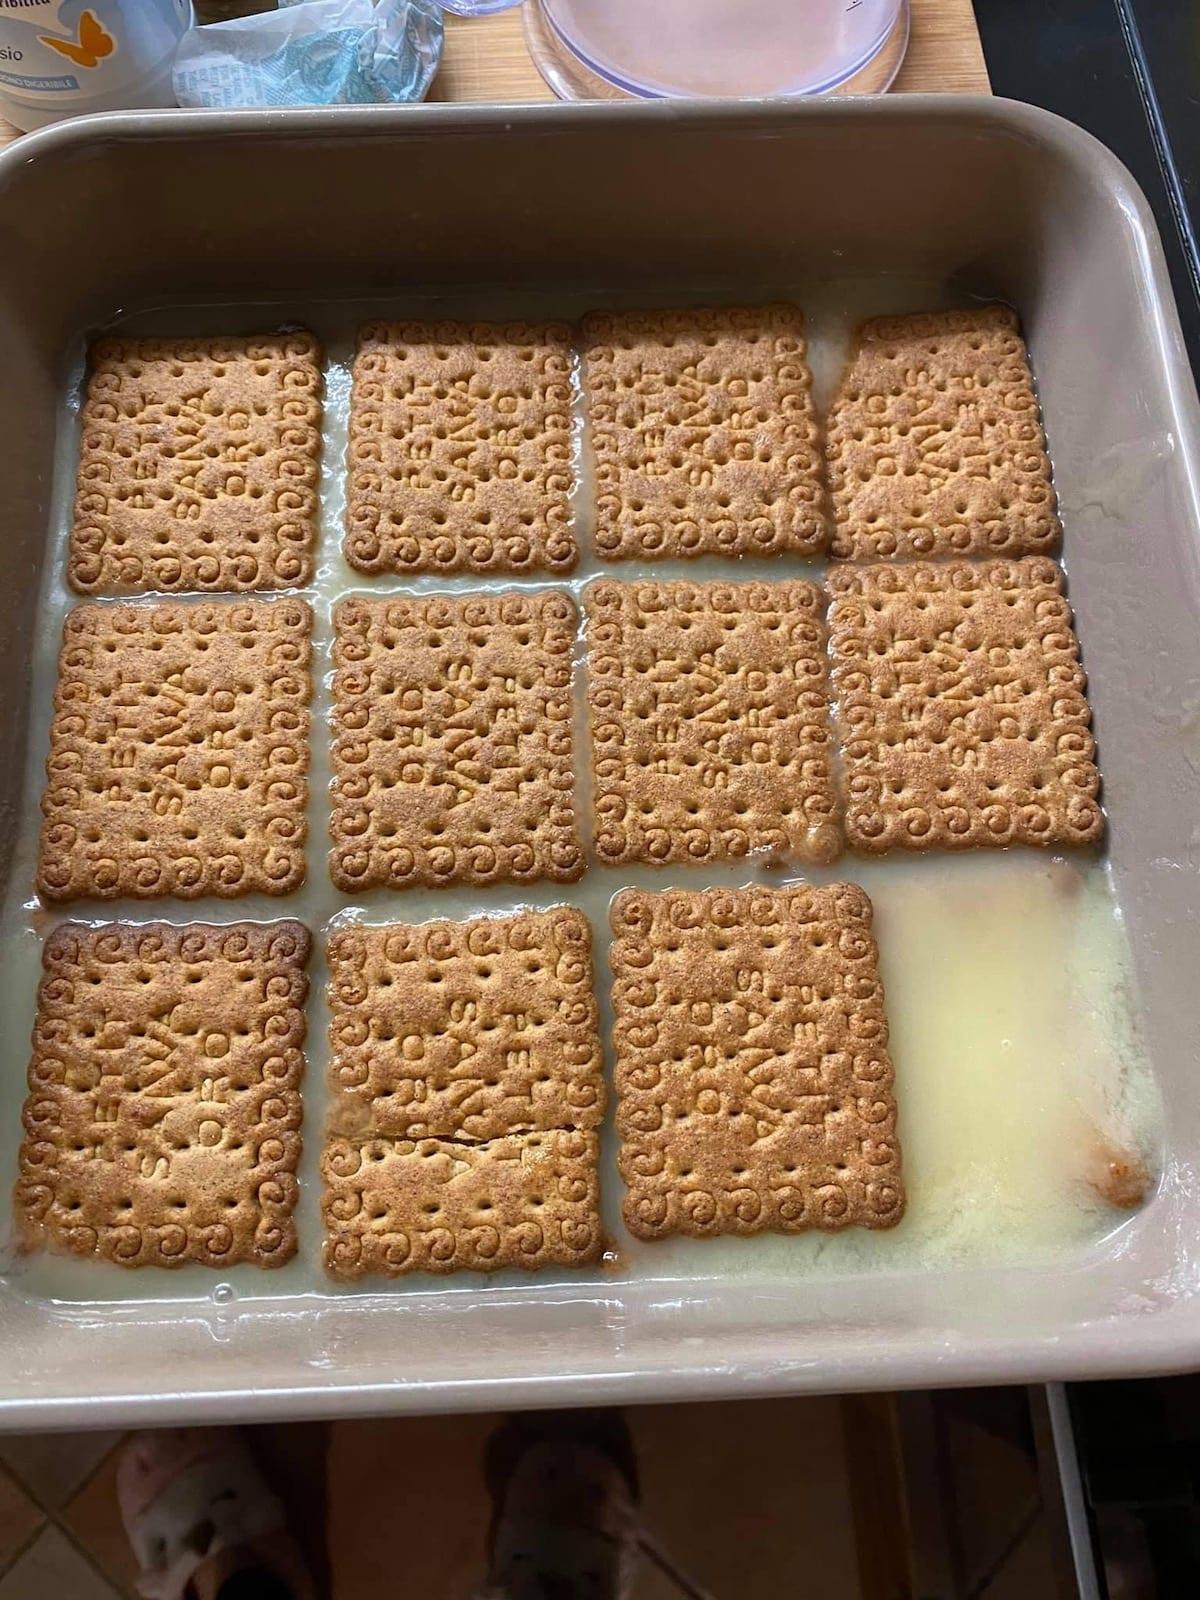 cucinaremale manca un biscotto